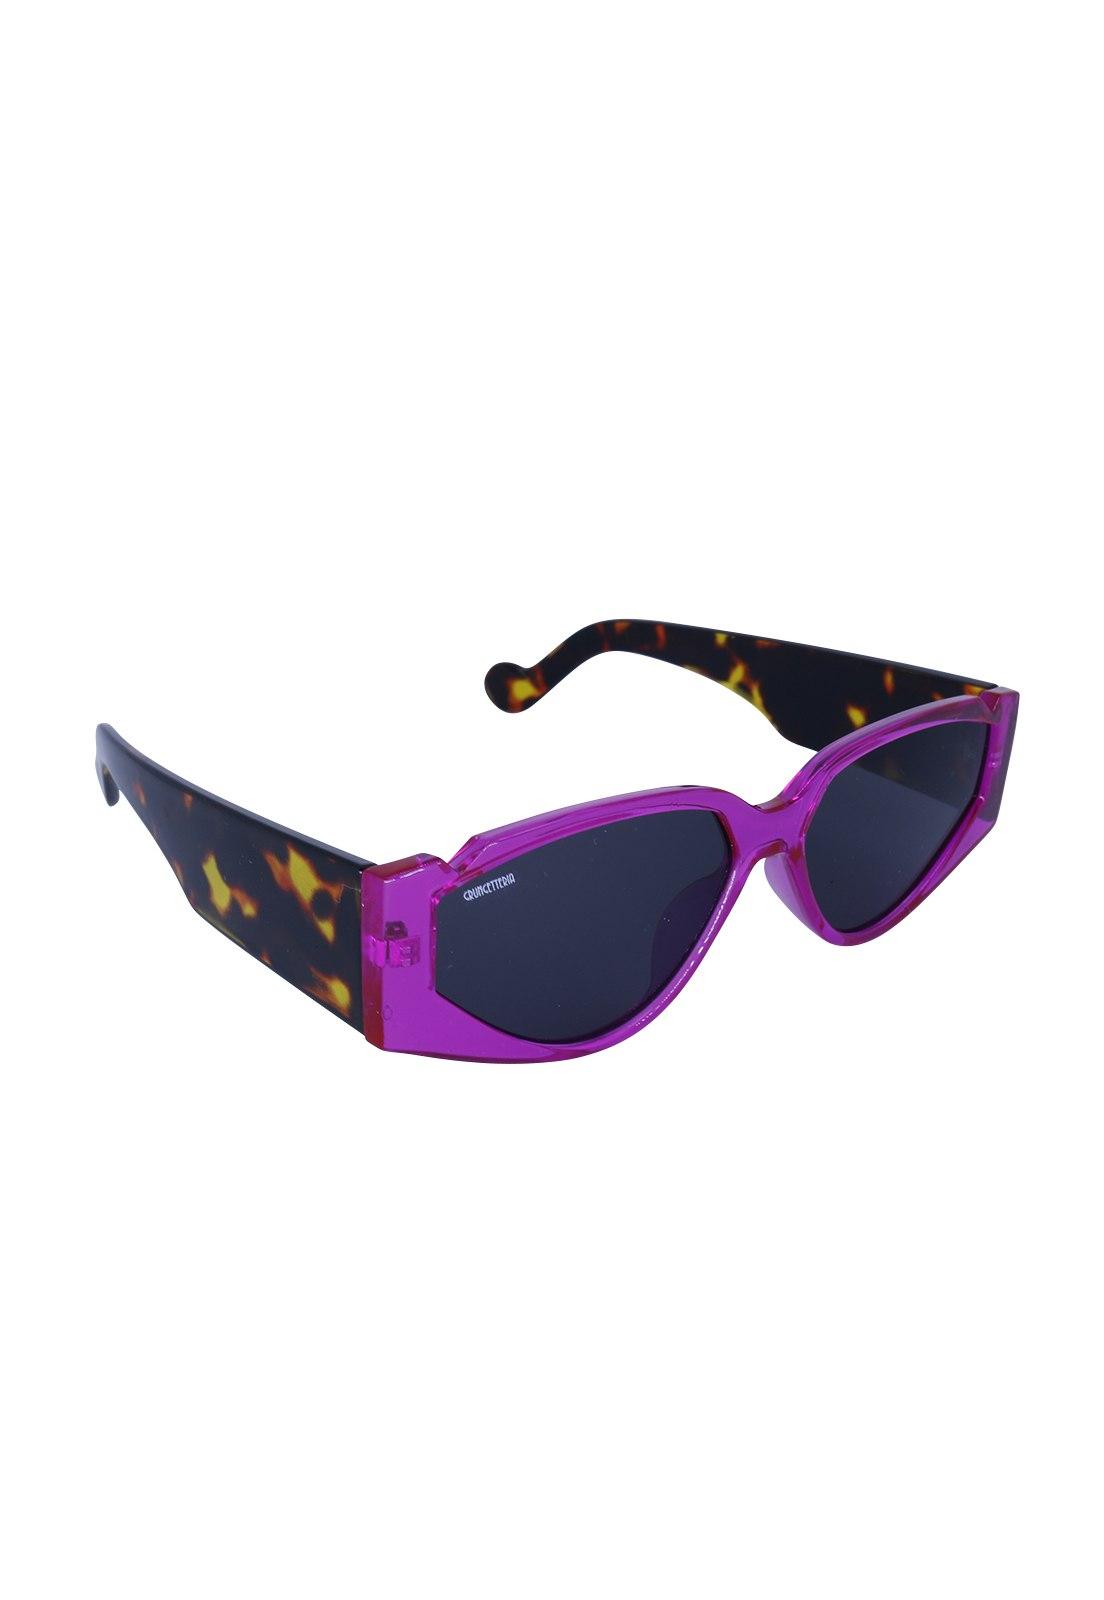 Óculos de Sol Grungetteria Jungle Roxa